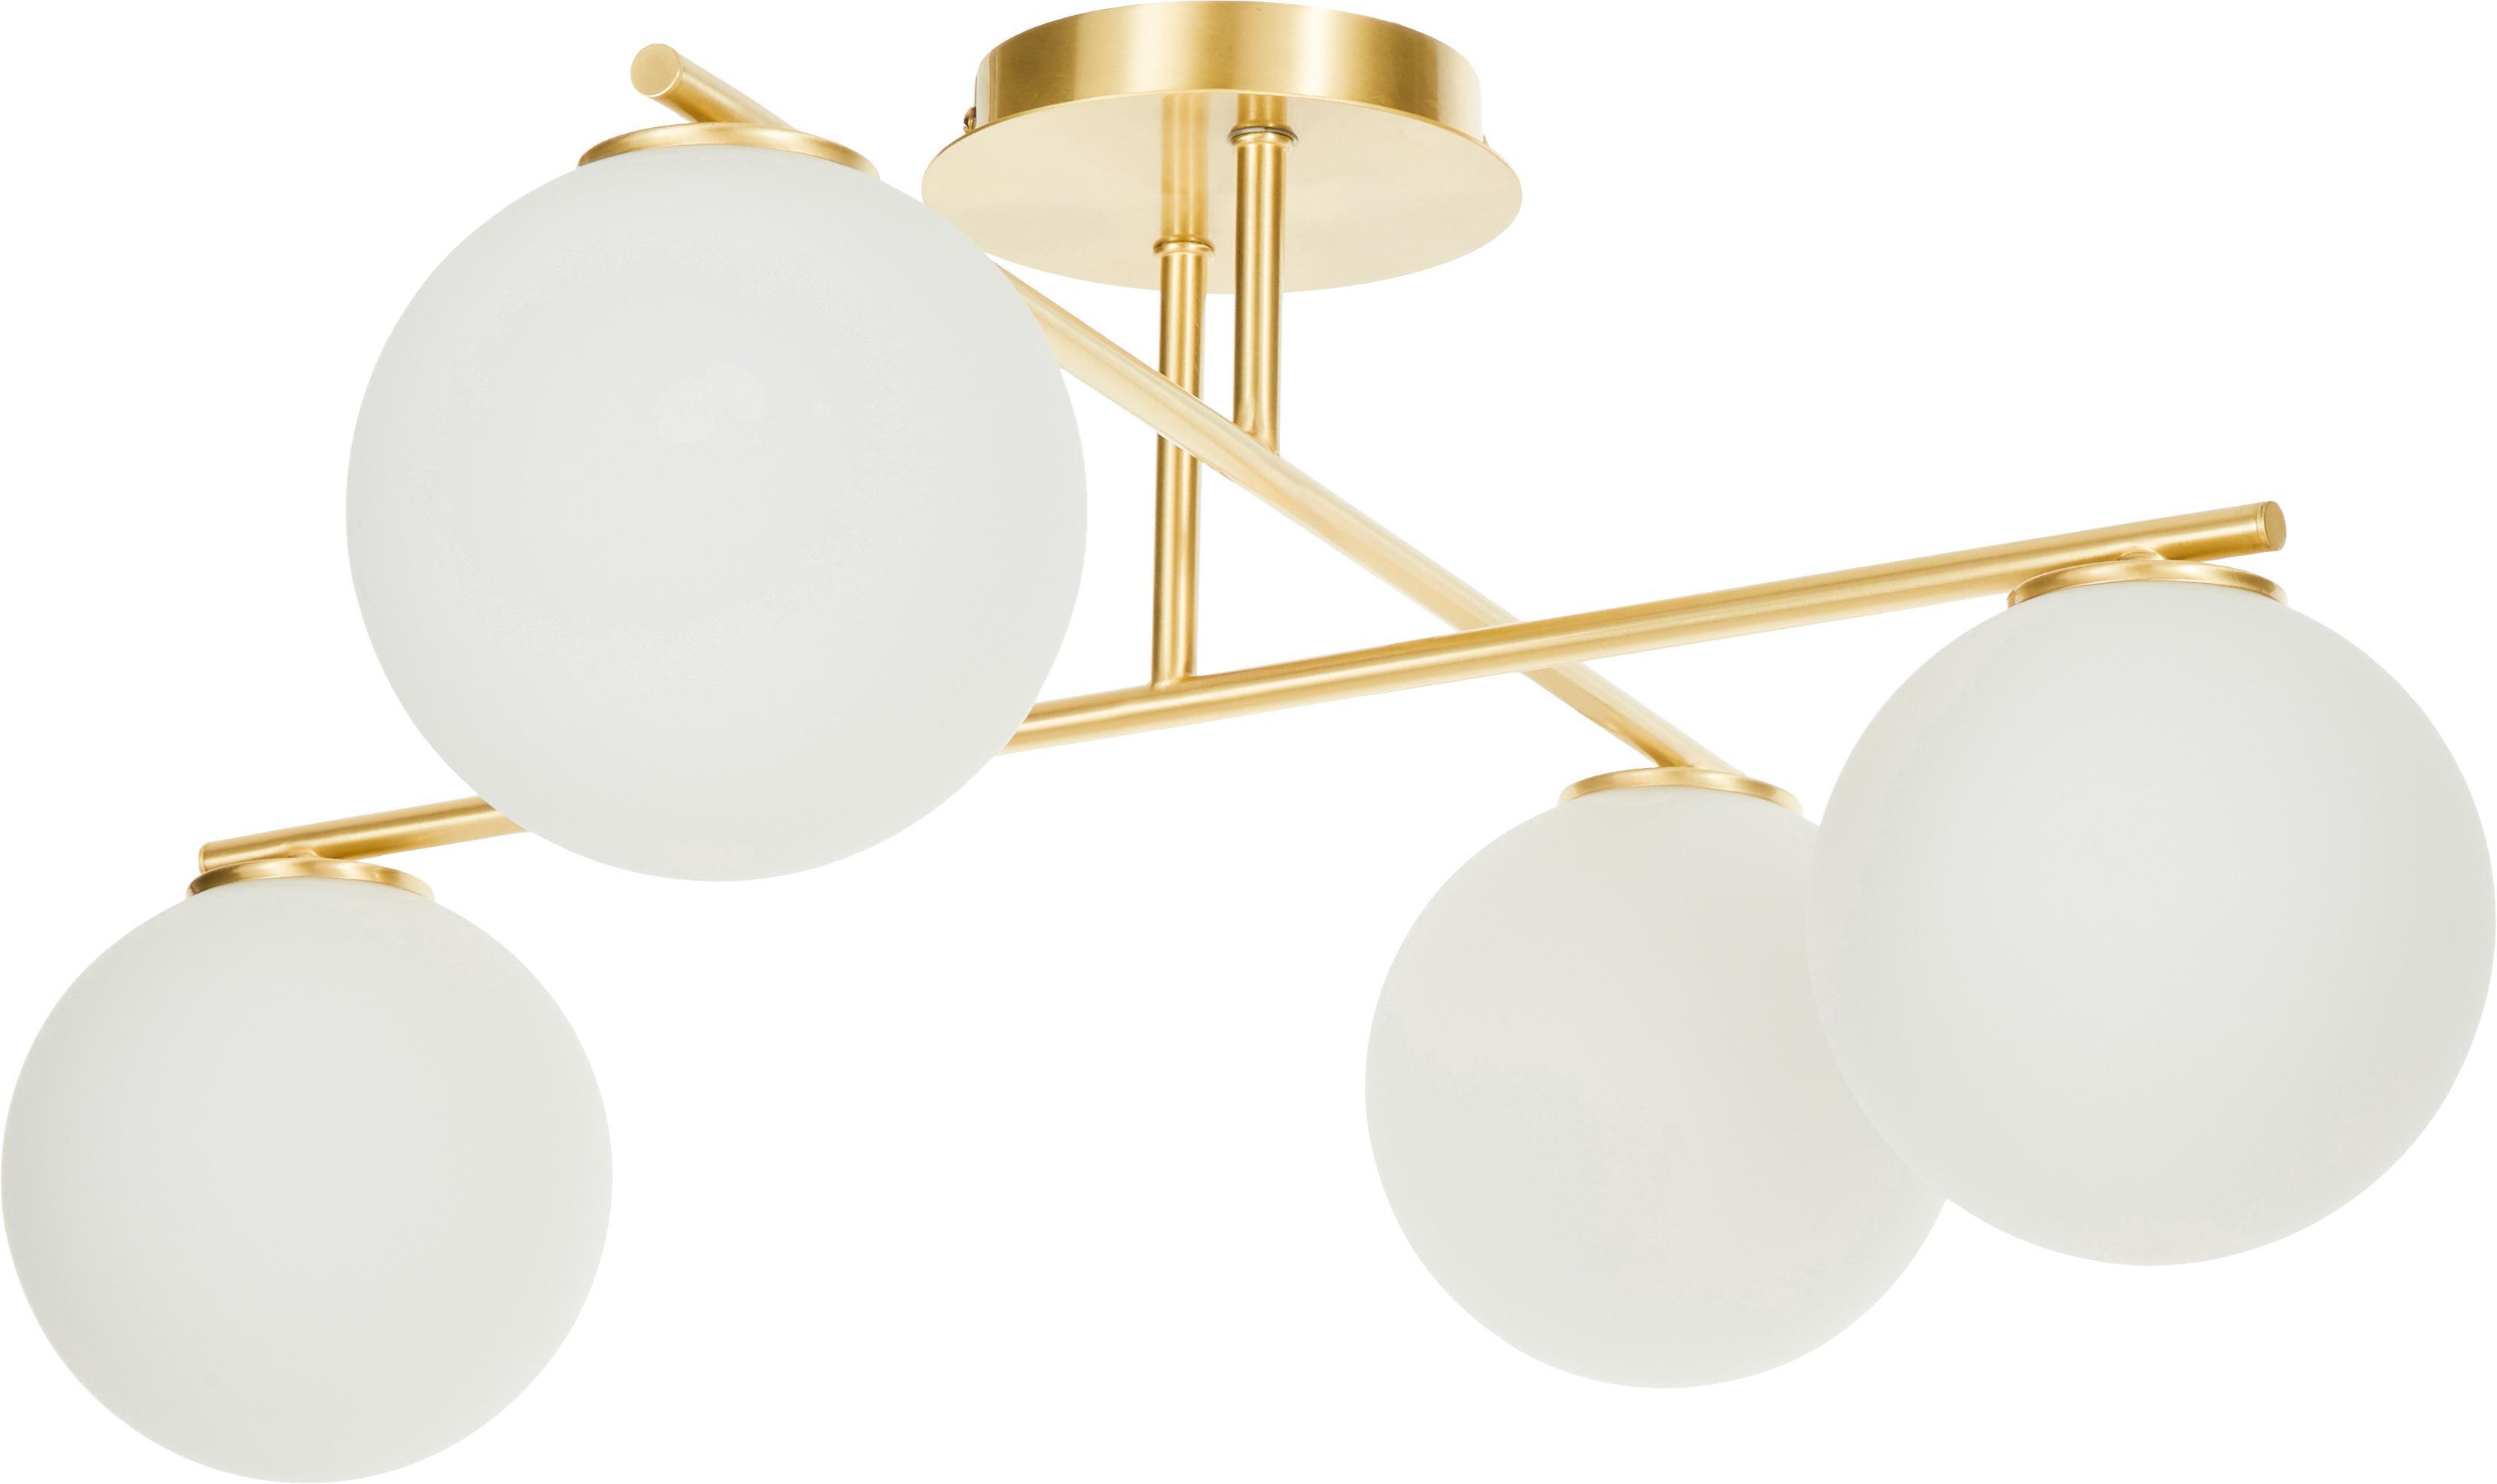 Deckenleuchte Atlanta in Gold, drehbar, Baldachin: Metall, vermessingt, Weiß, Messing, 65 x 30 cm